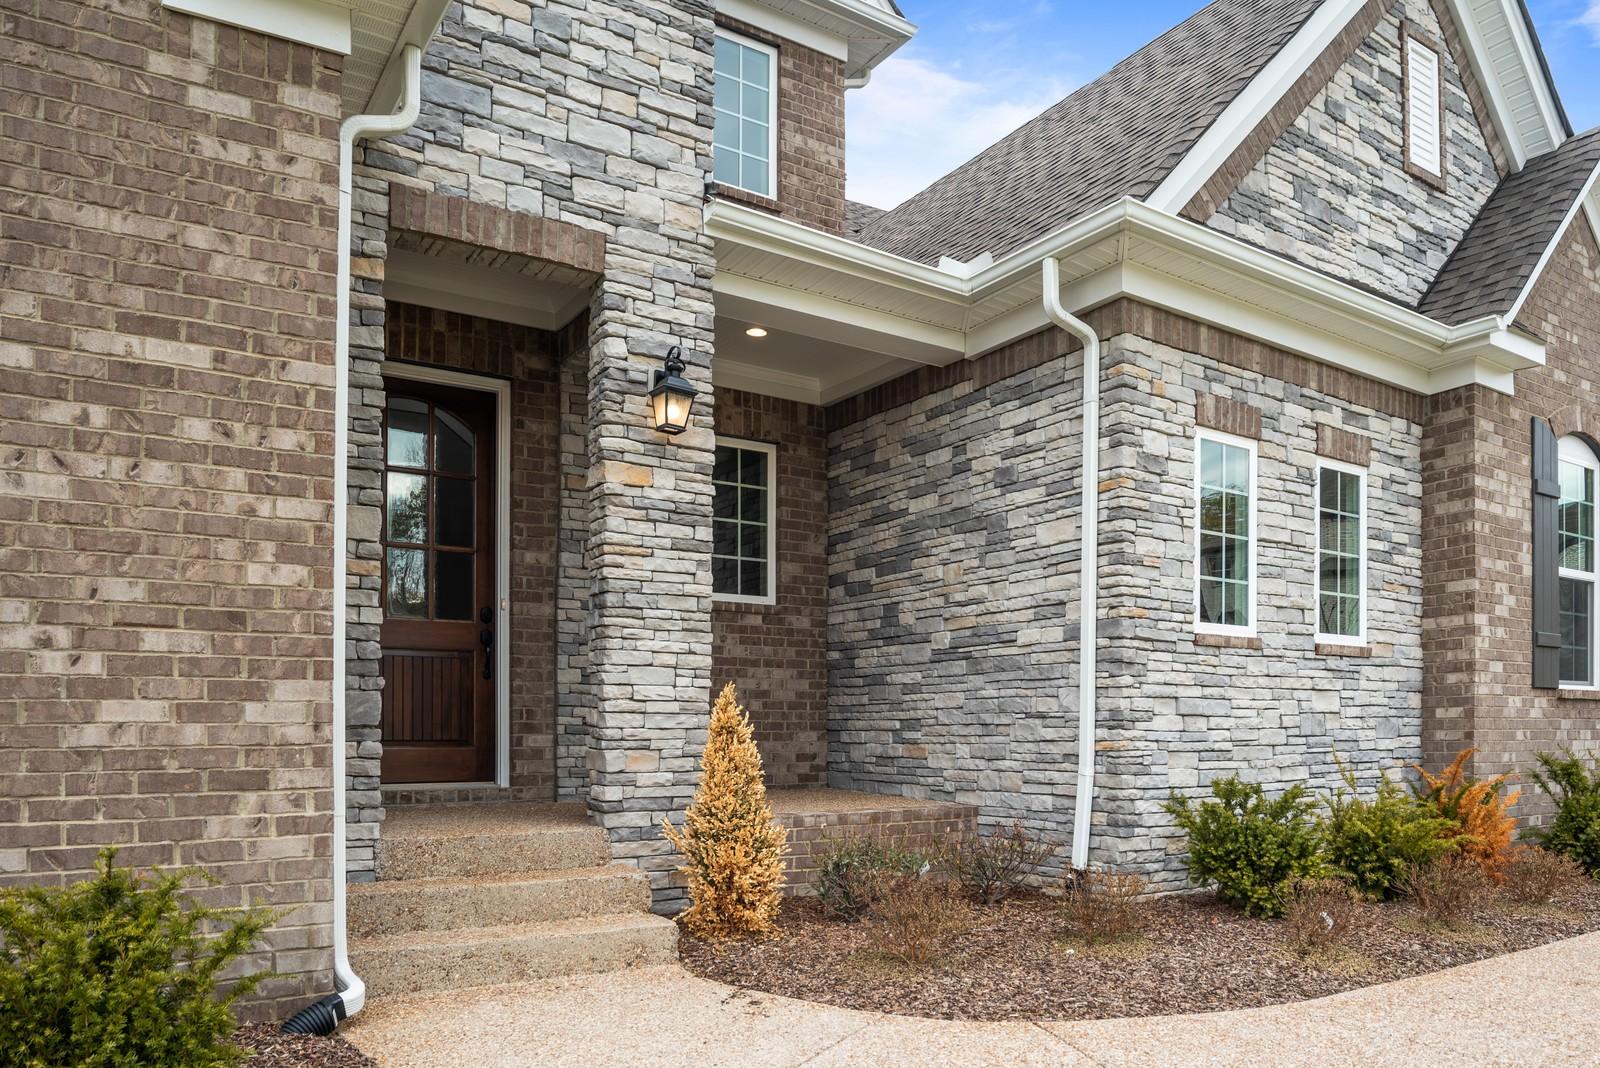 159 Telfair Lane #14, Nolensville, TN 37135 - Nolensville, TN real estate listing